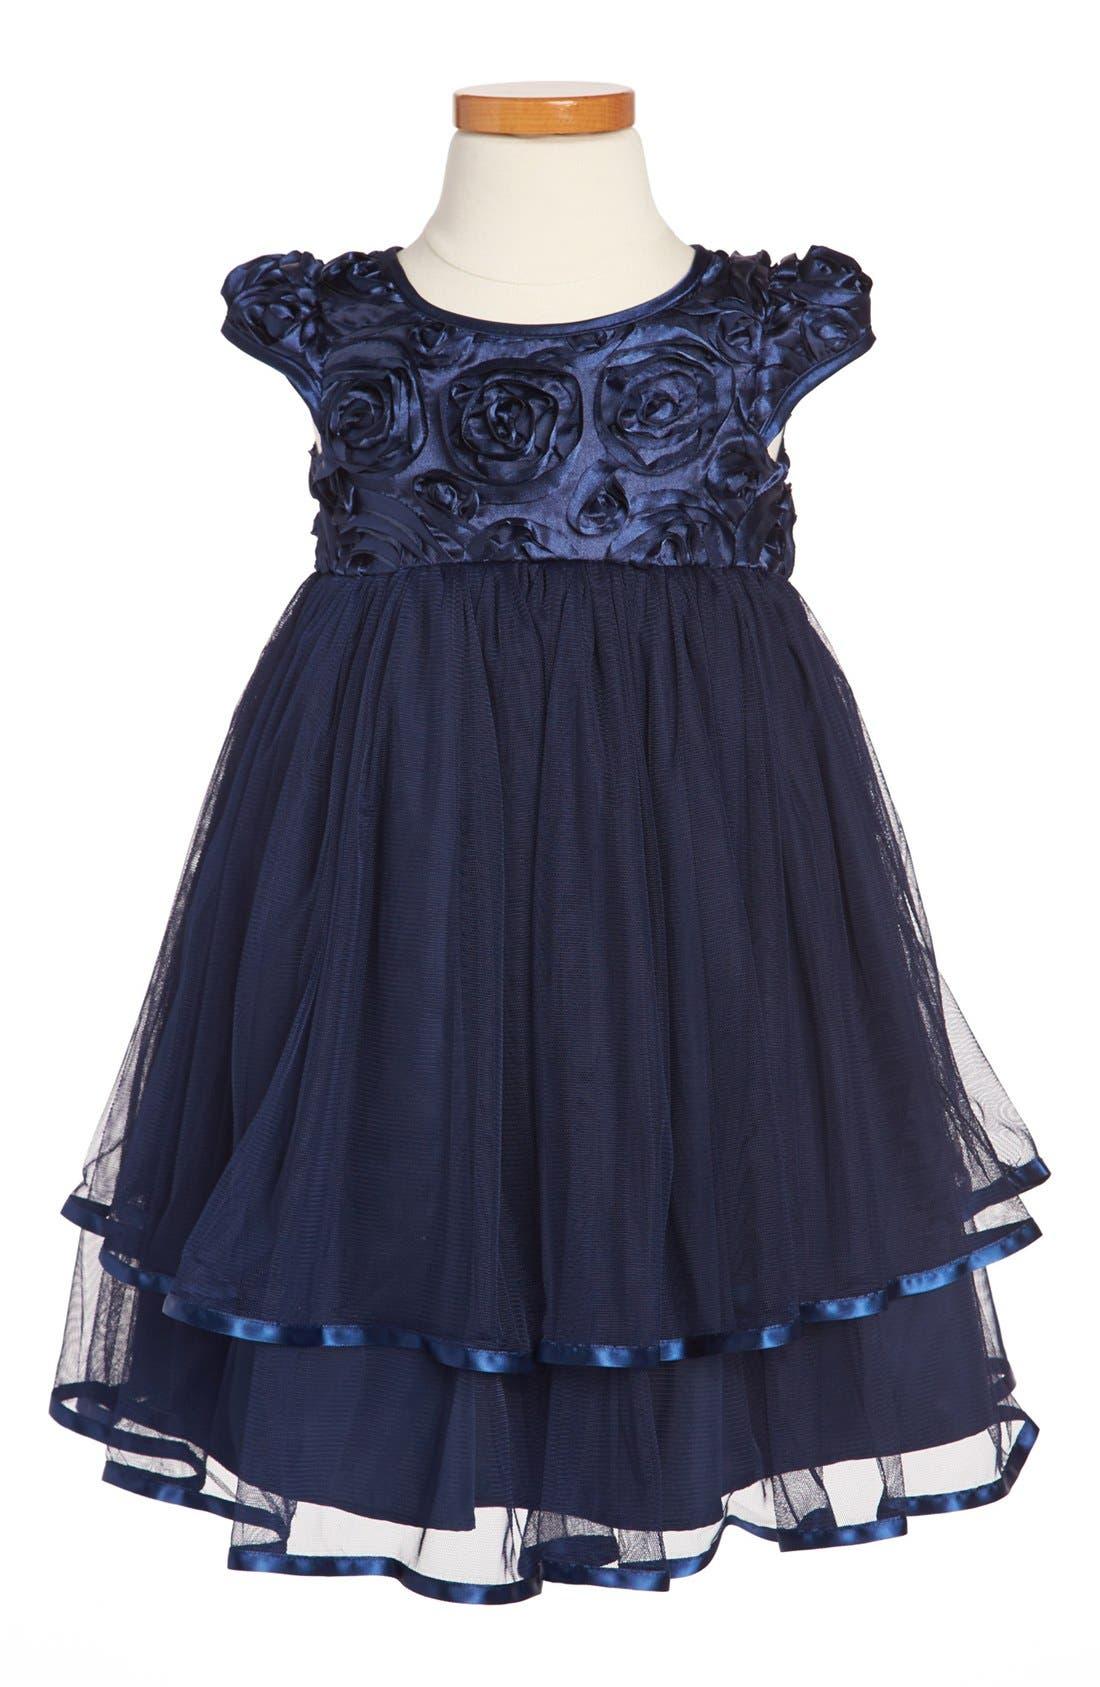 Alternate Image 1 Selected - Pippa & Julie Dress (Toddler Girls)